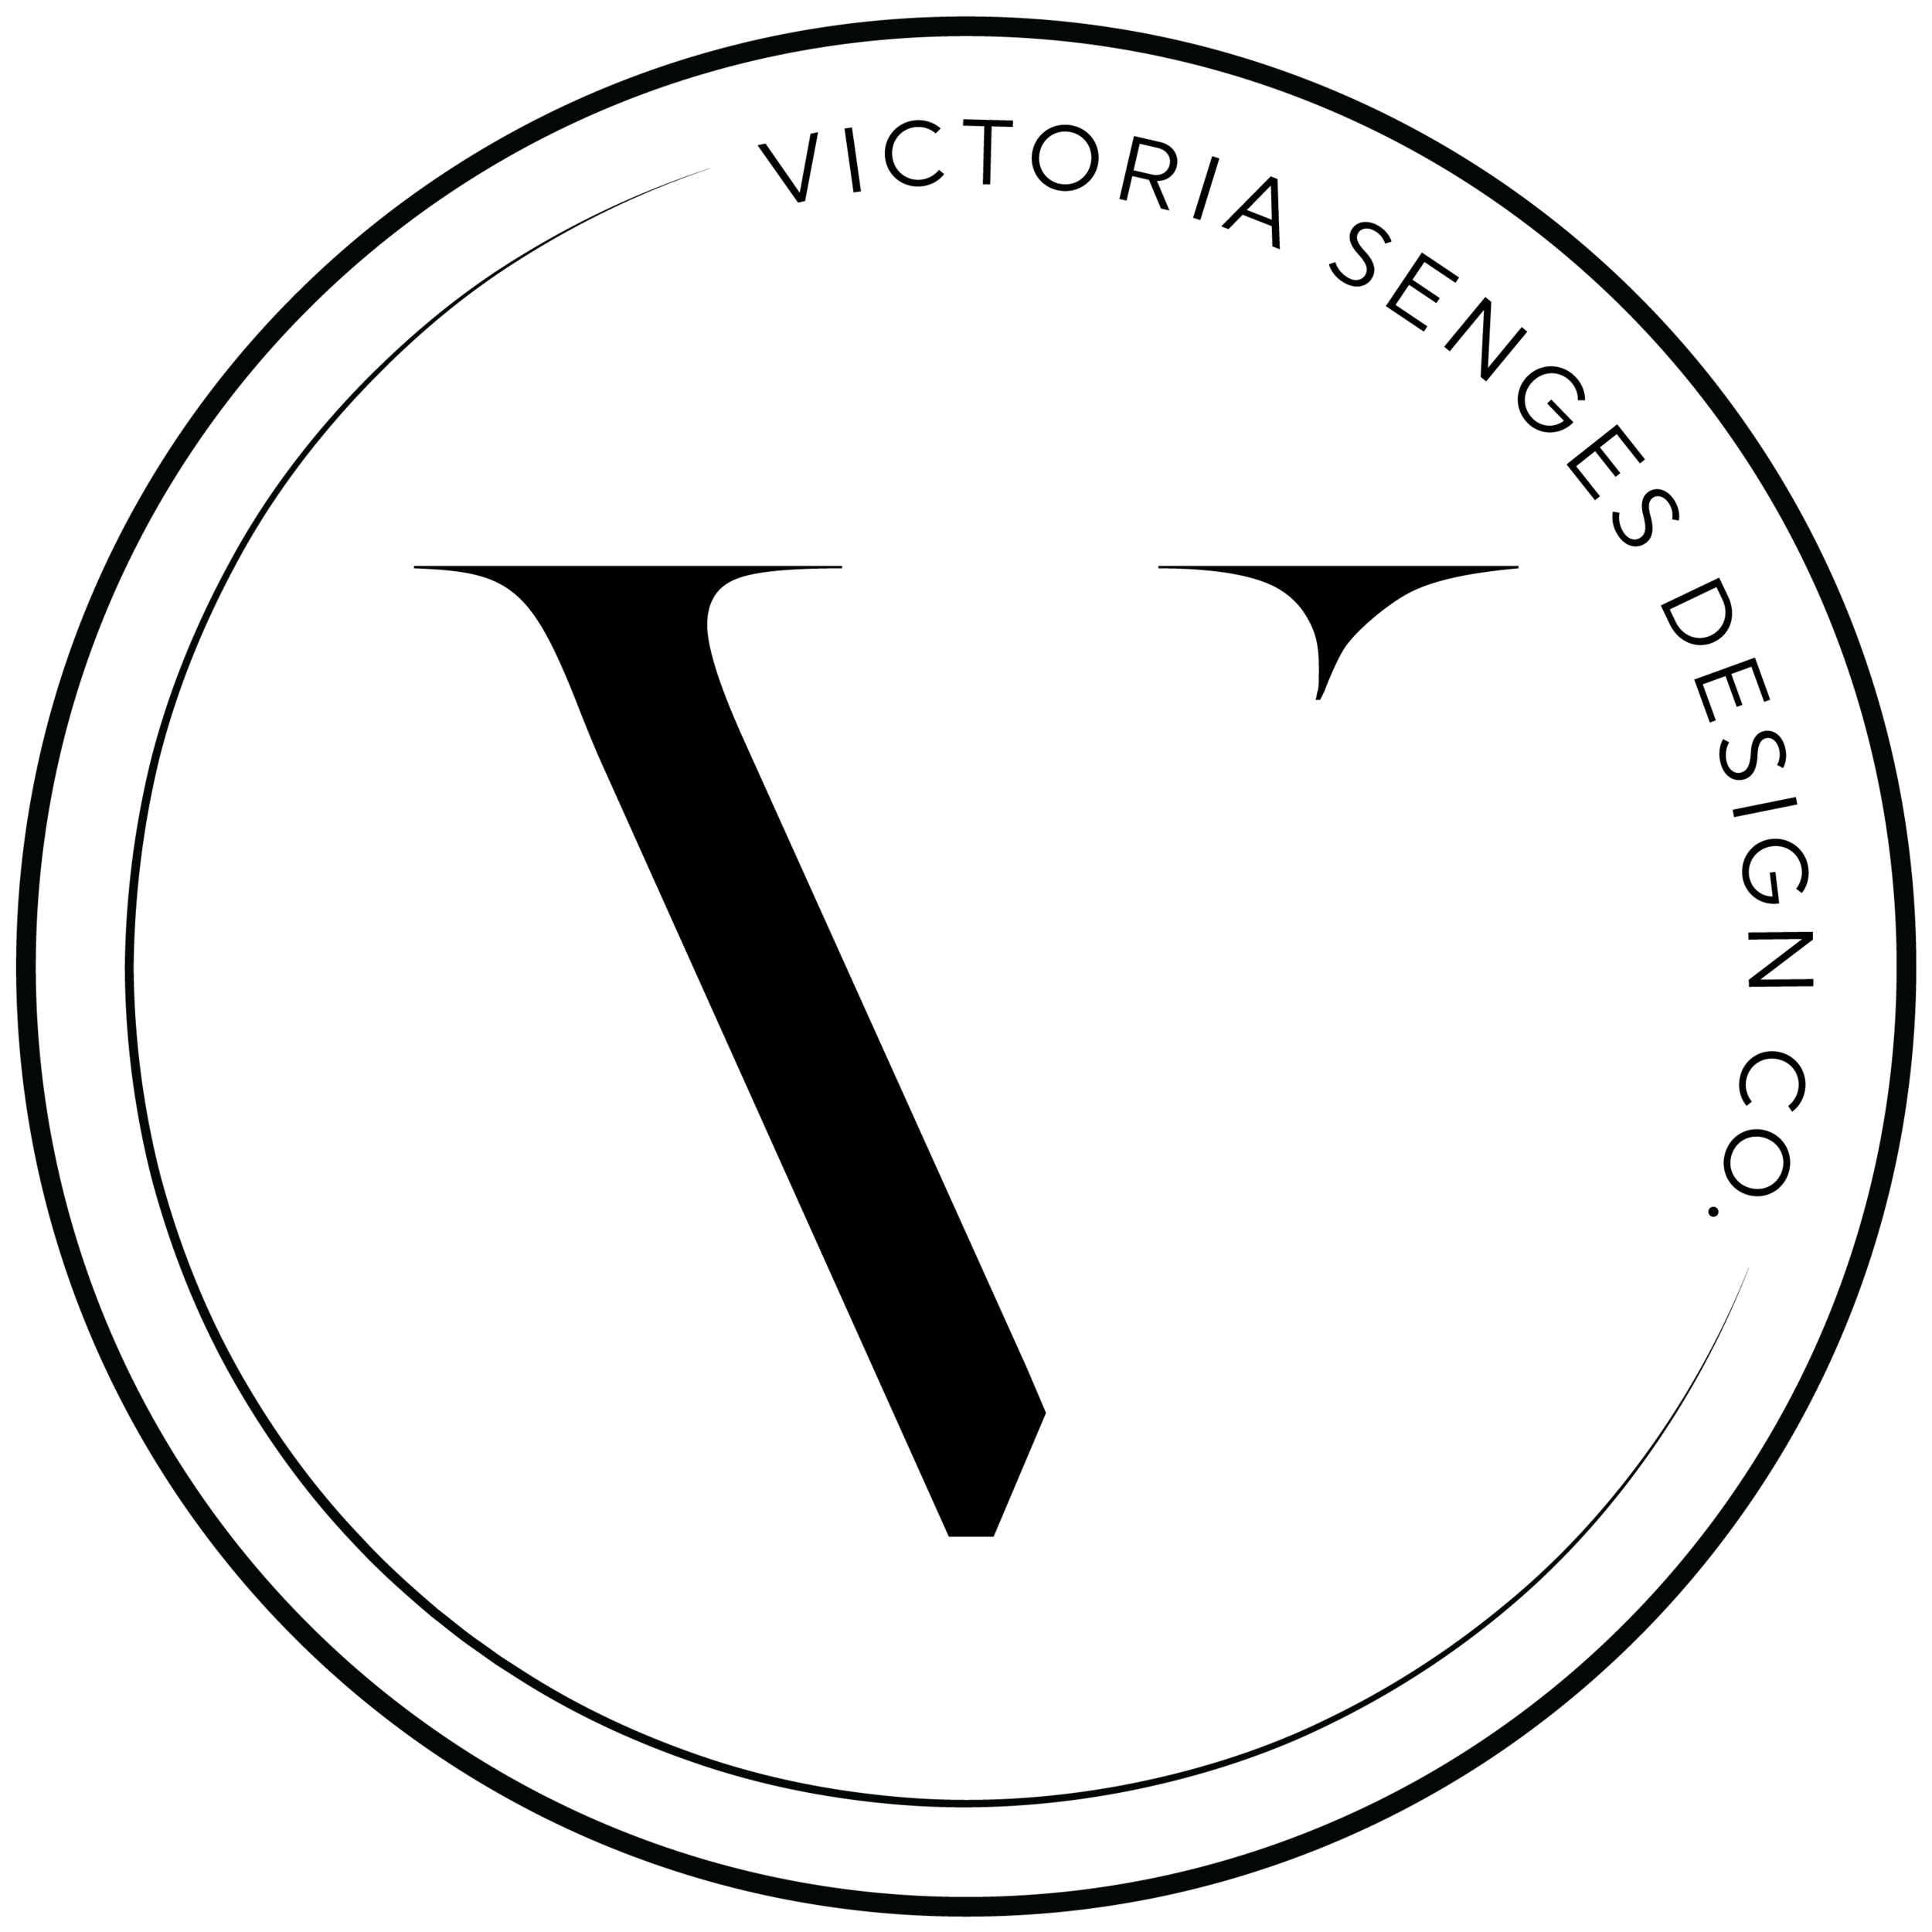 VSDC_Branding-2019-Submark-Black_2.png